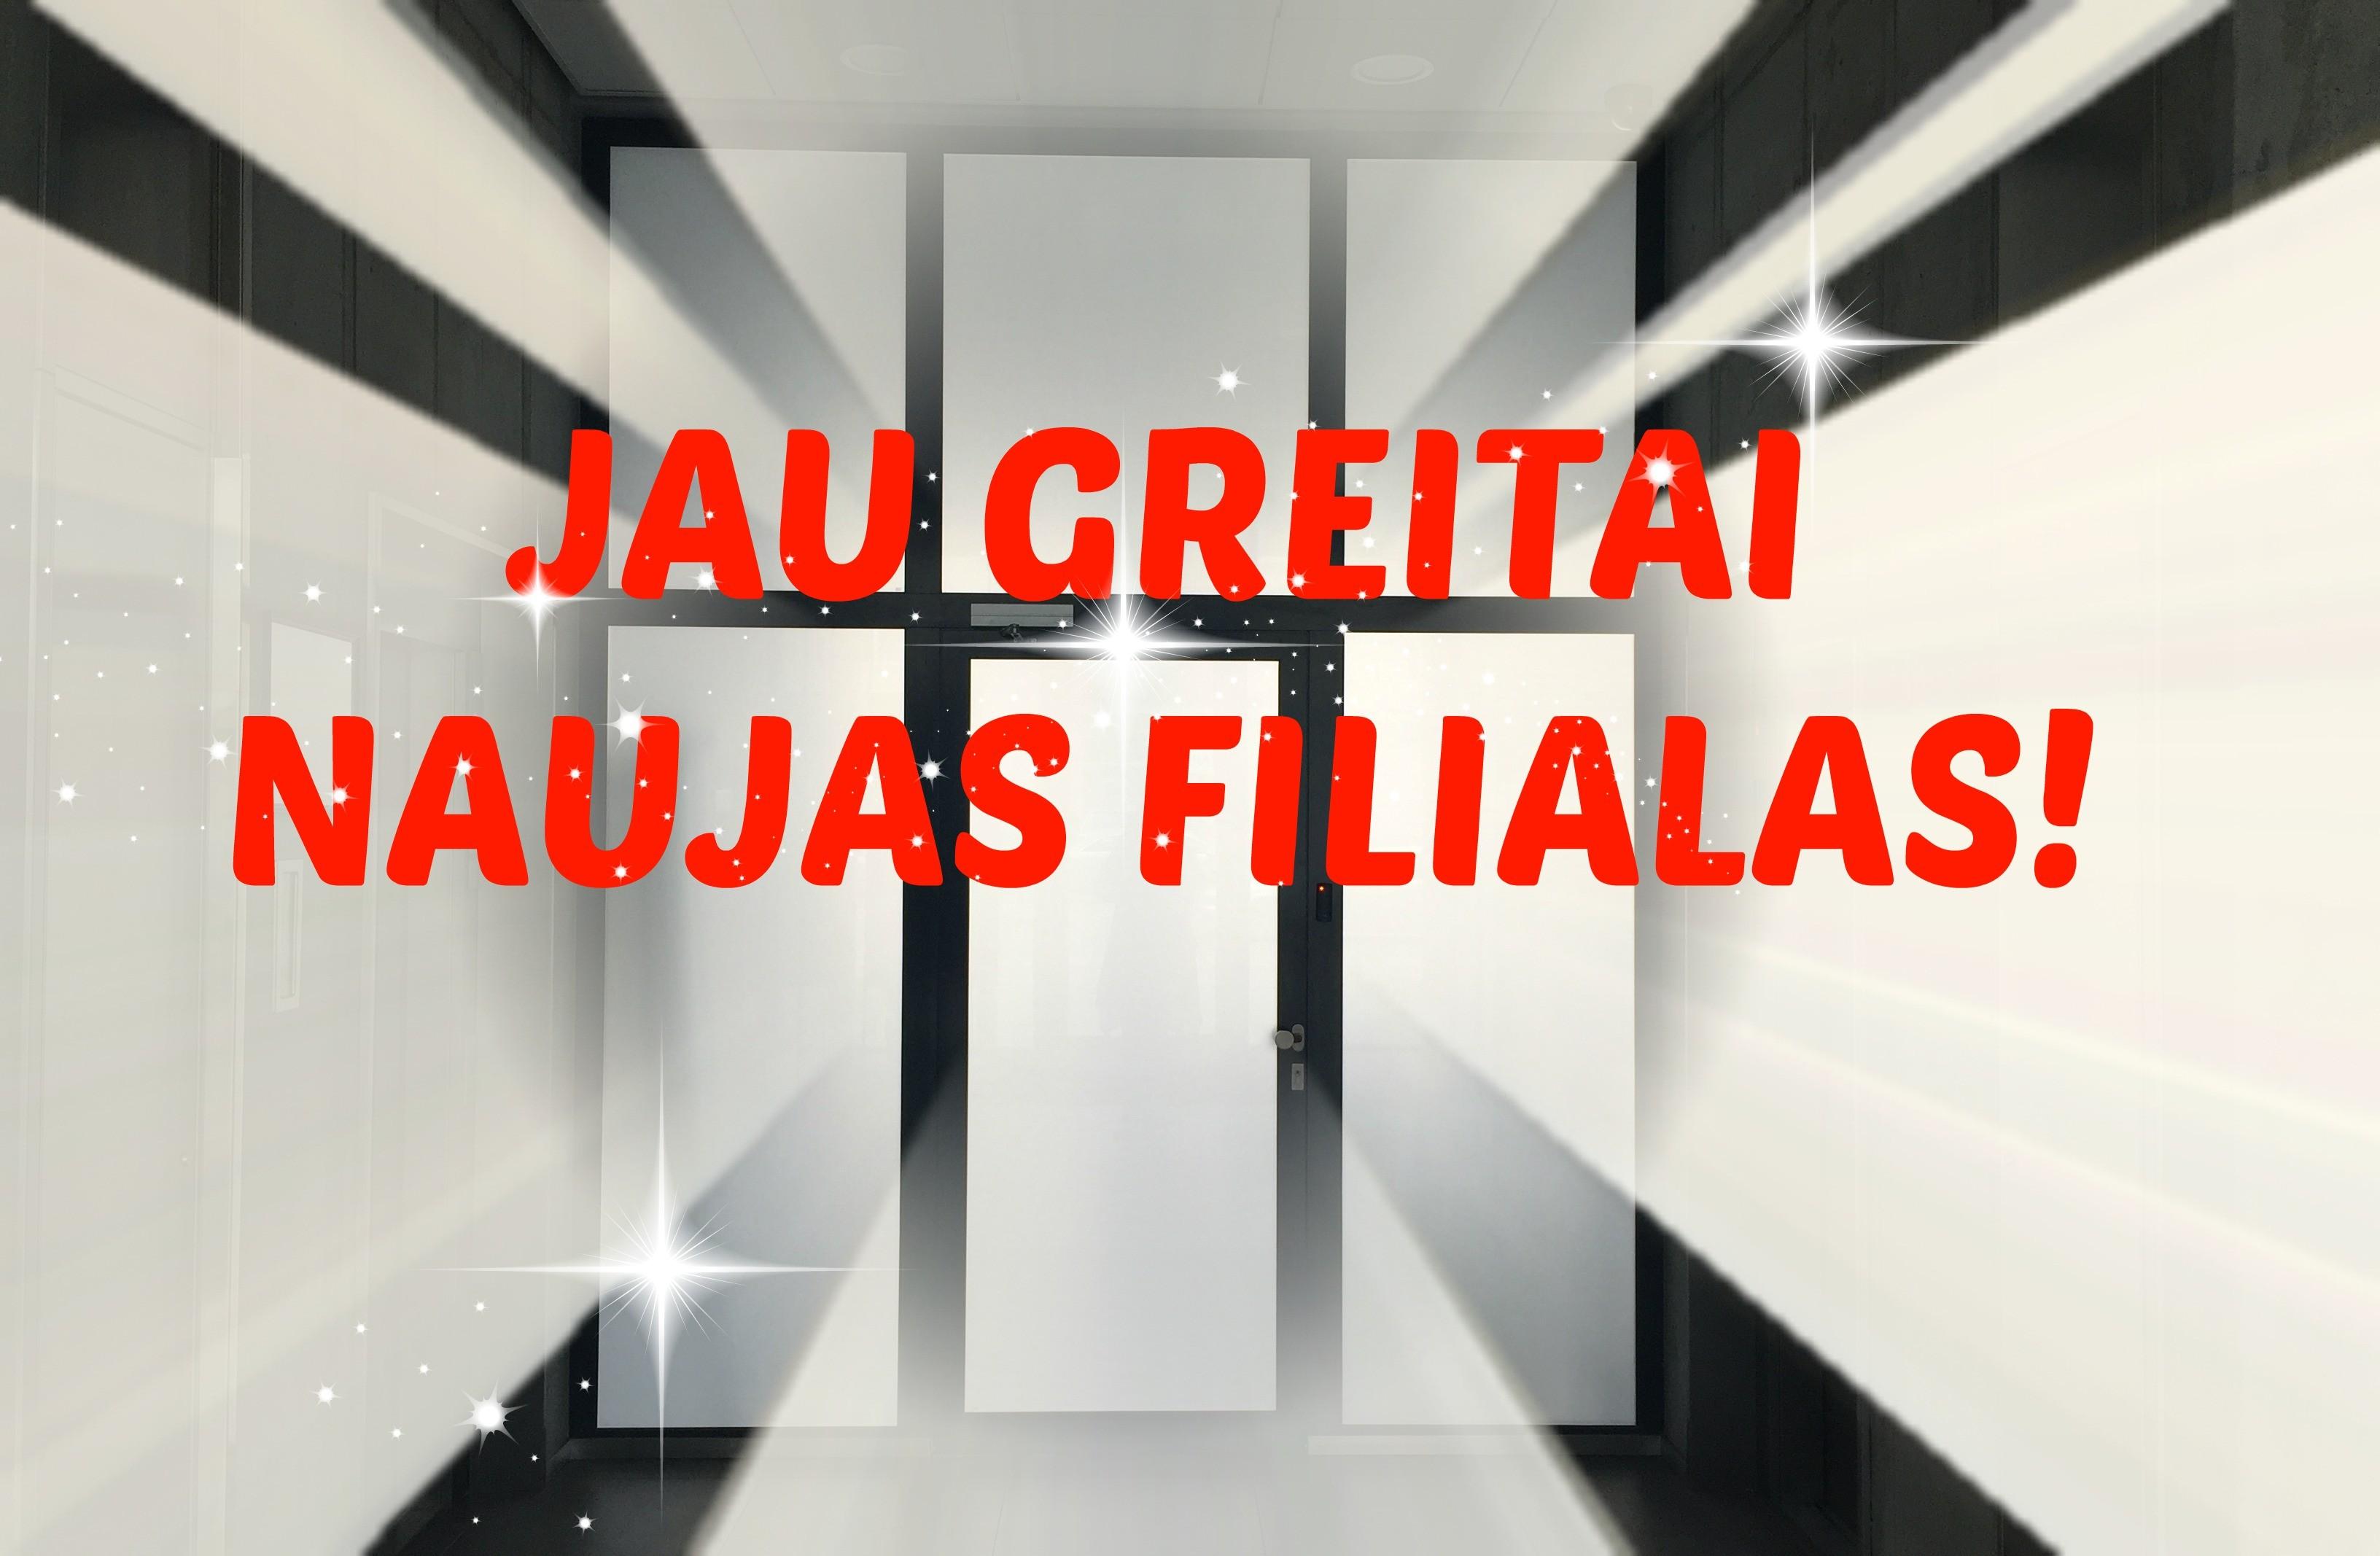 FILIALAS